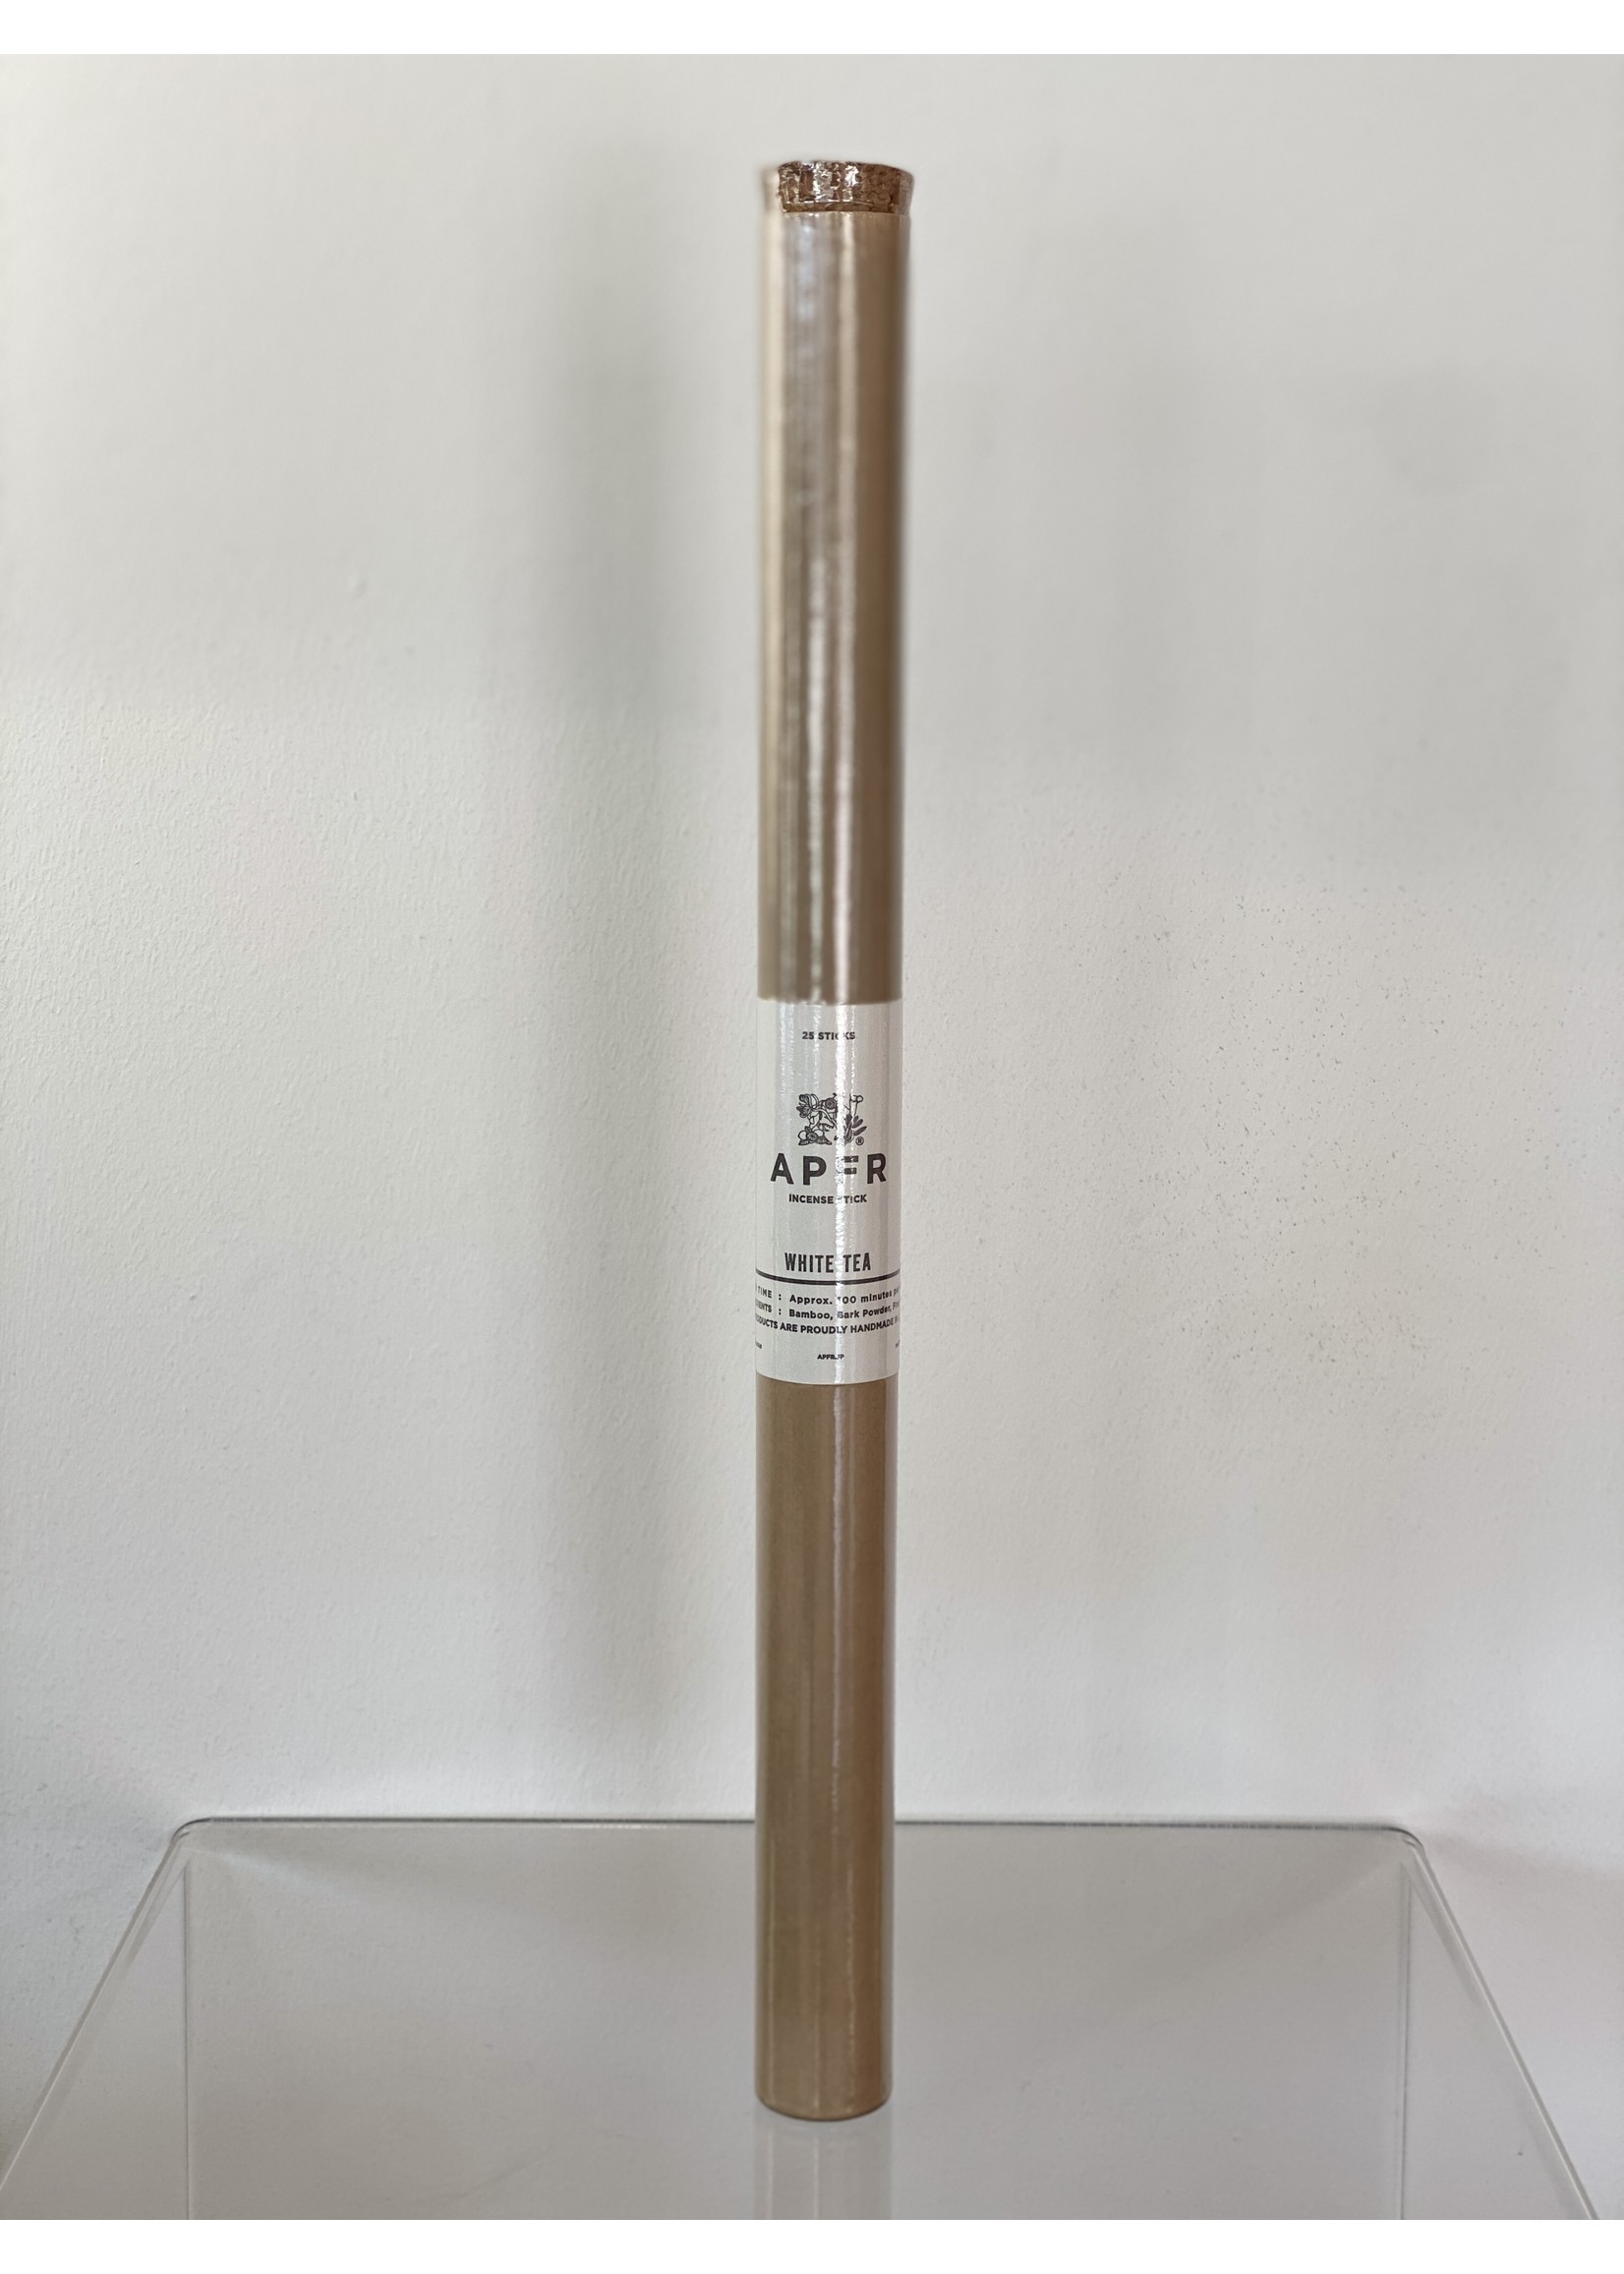 APFR Japan Japanese Incense: White Tea